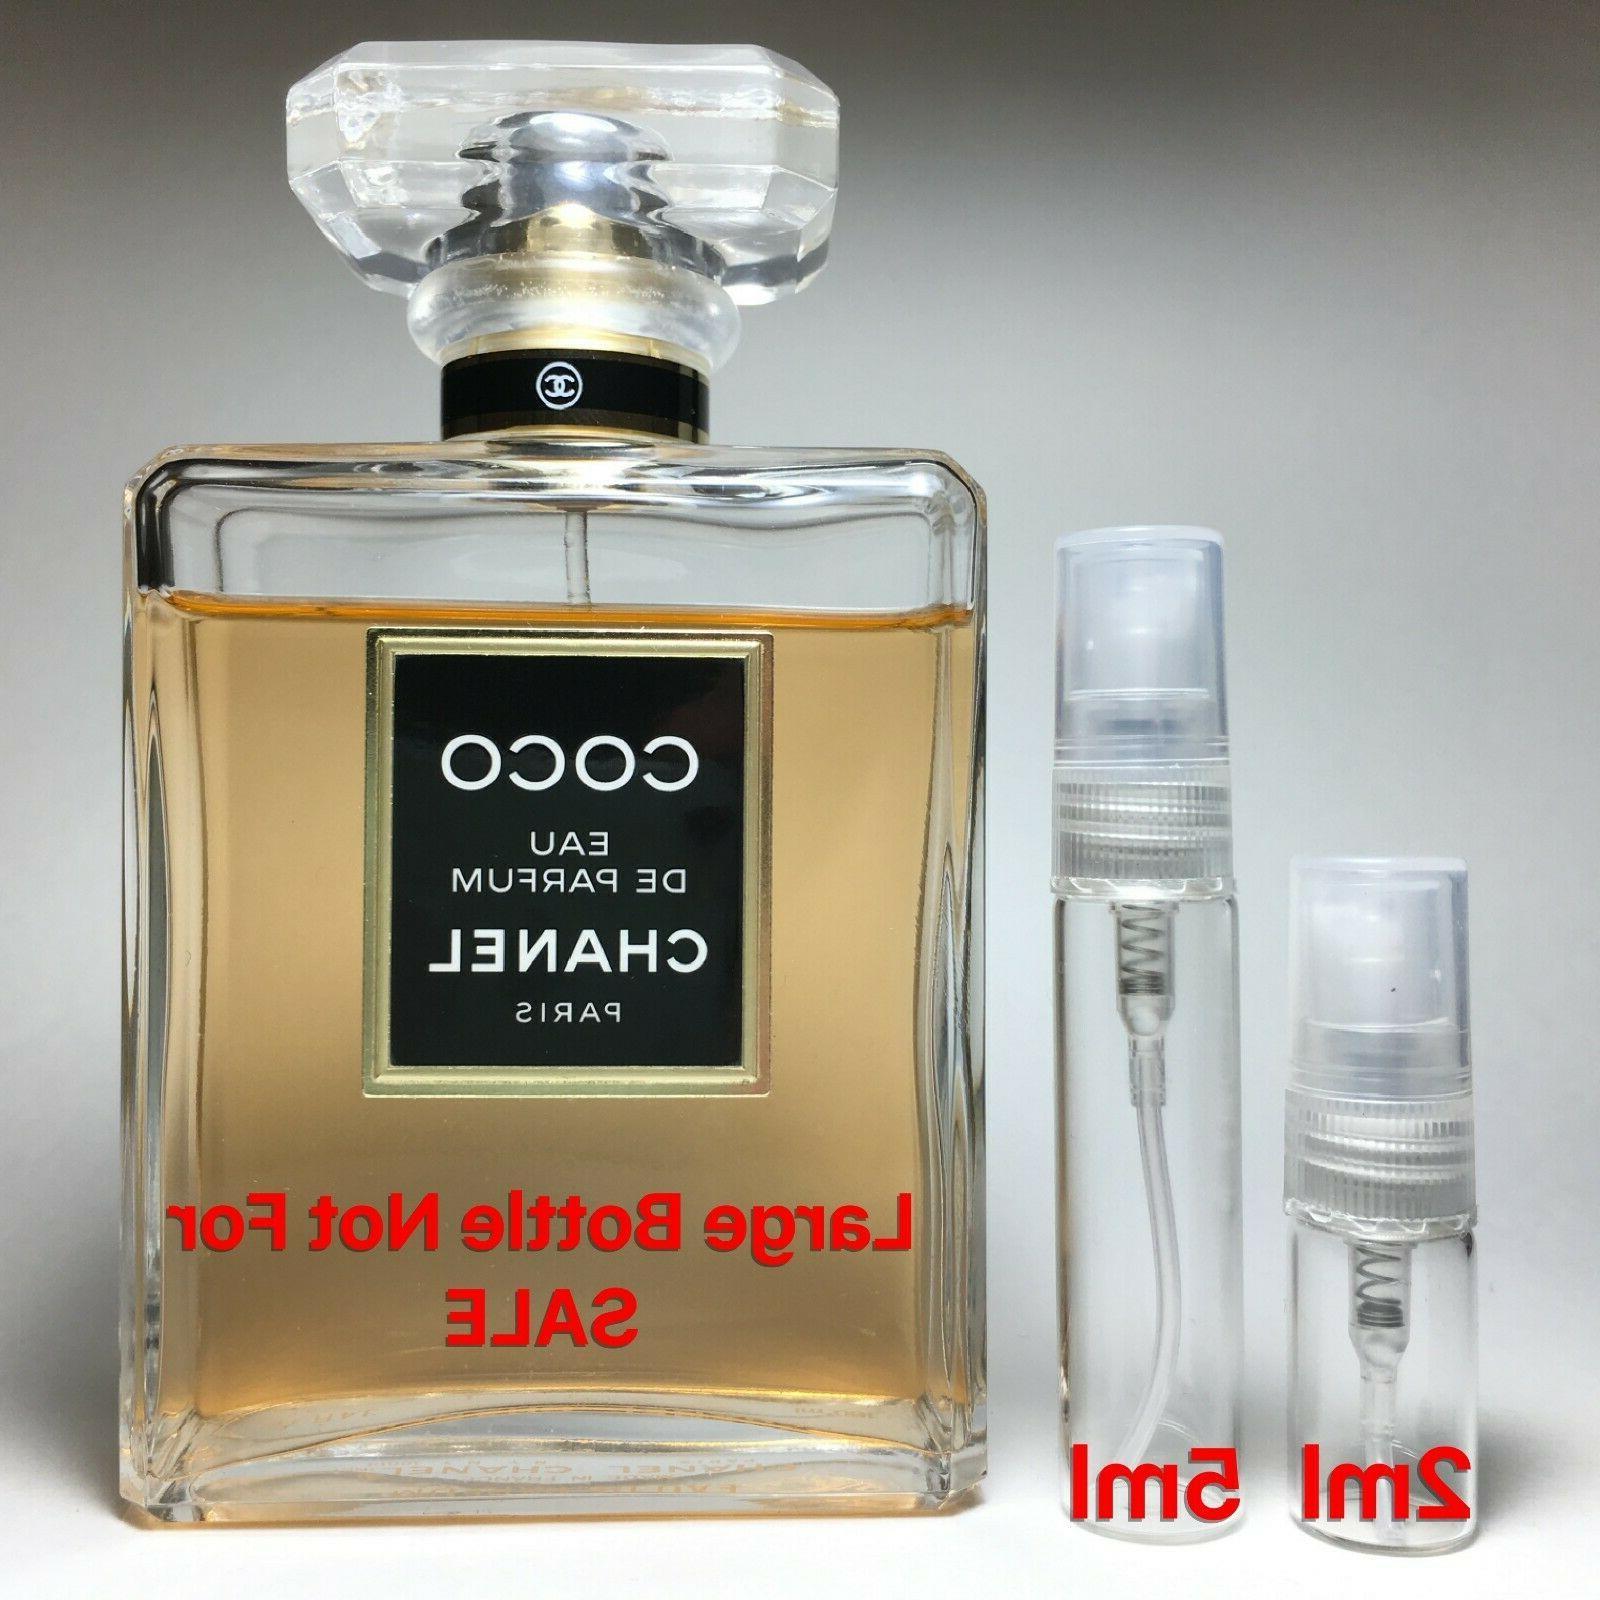 coco eau de parfum sample 2ml or